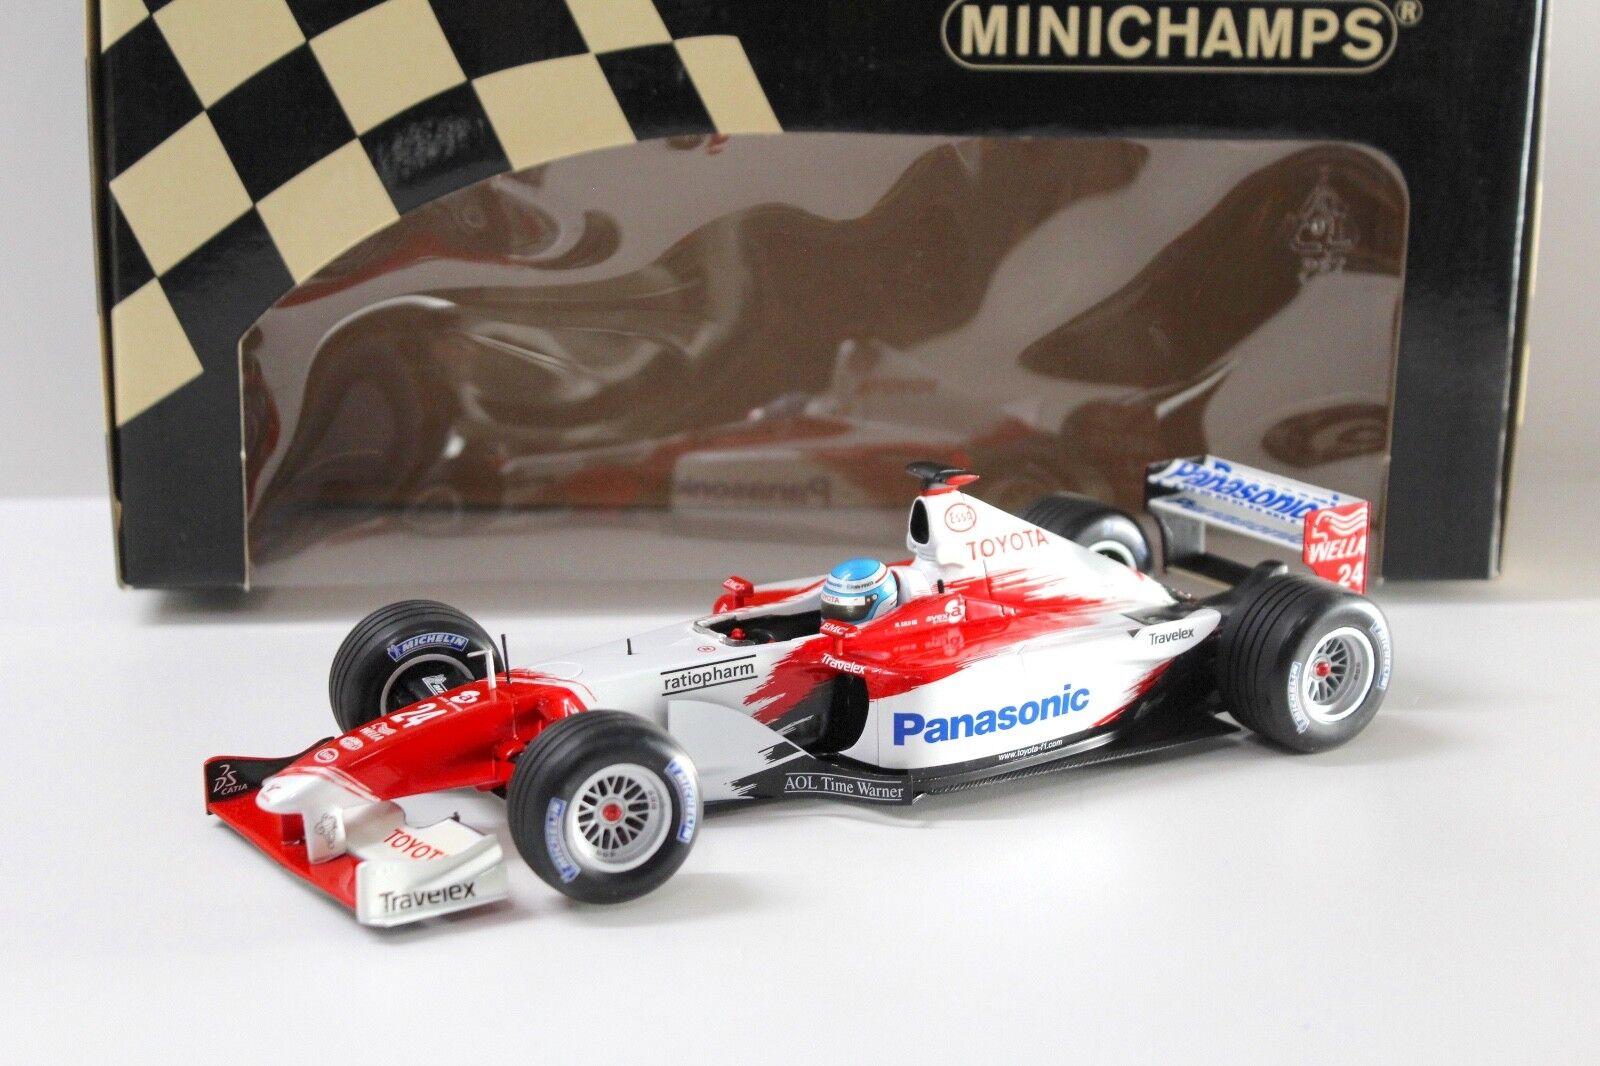 1 18 18 18 Minichamps panasonic toyota racing tf102 m. salo New en Premium-modelcars 5ec3ab